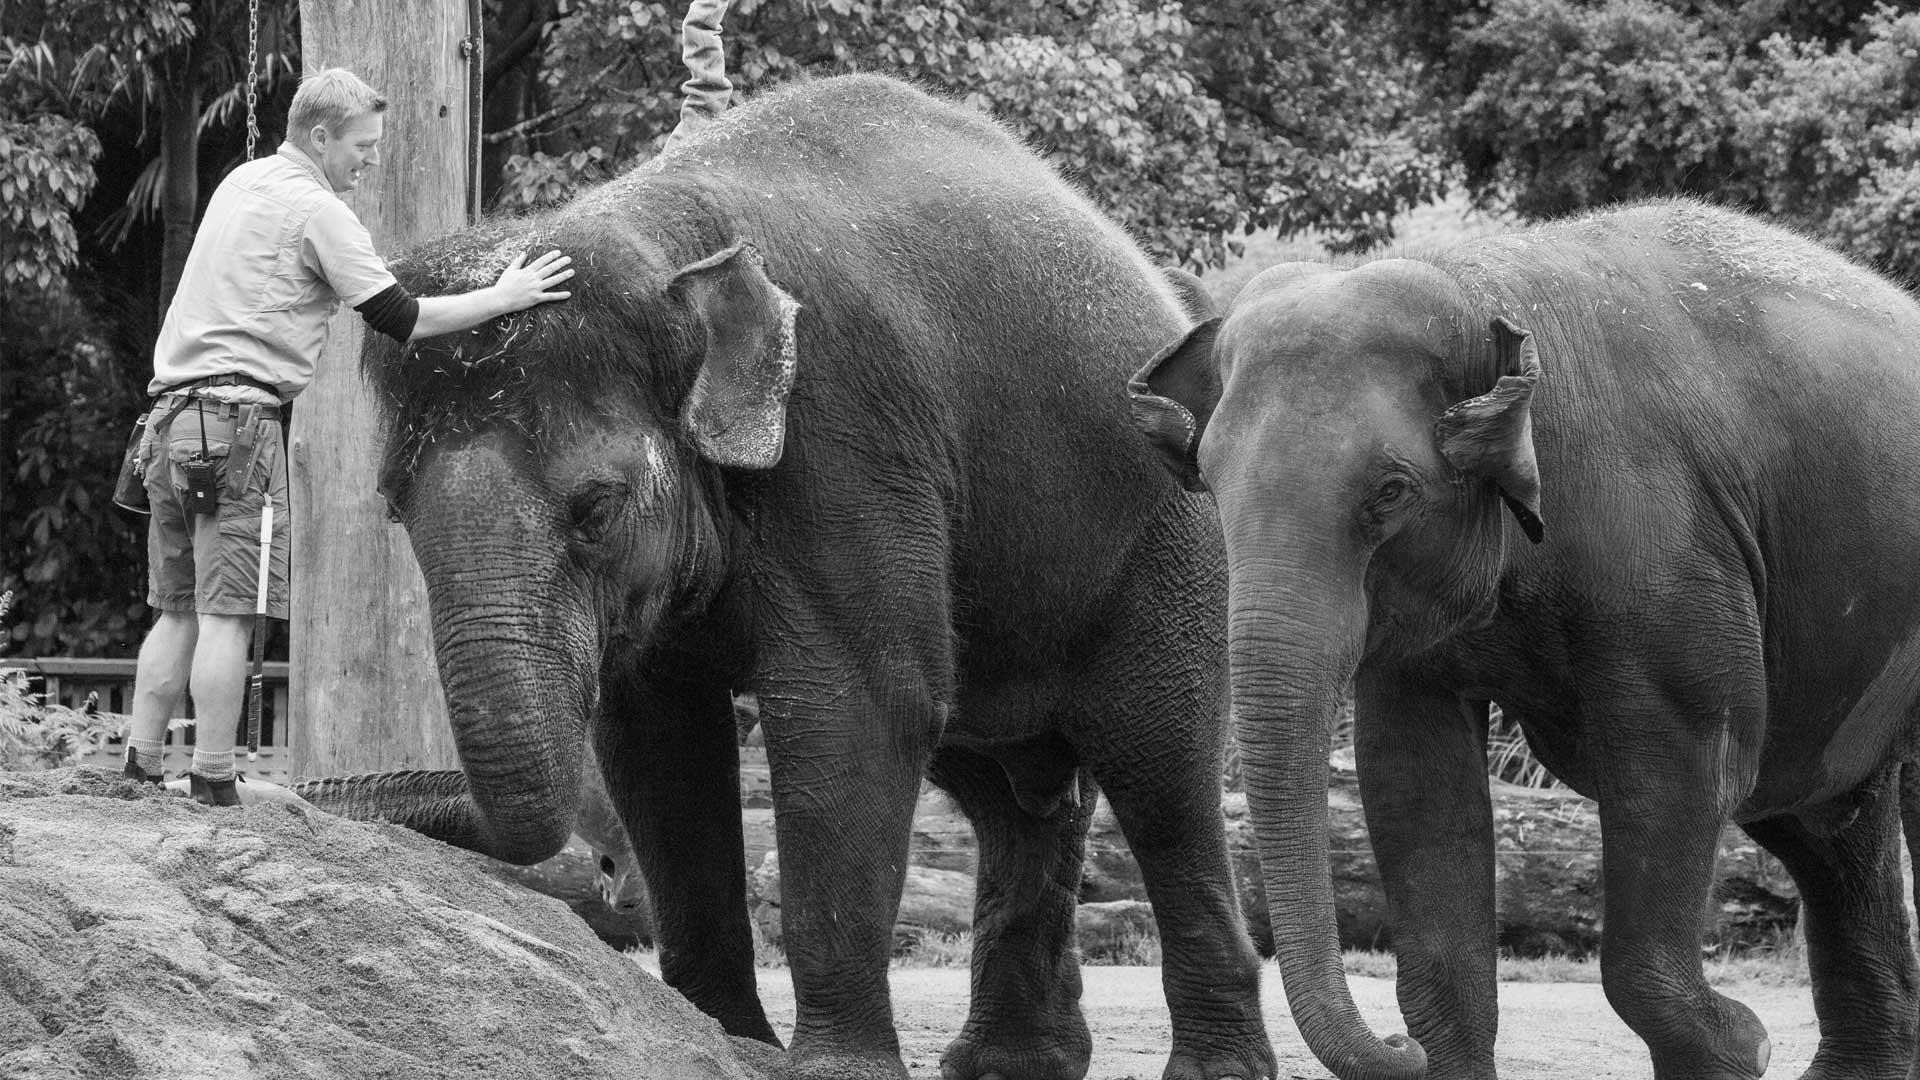 https://rfacdn.nz/zoo/assets/media/world-elephant-day-gallery-3.jpg